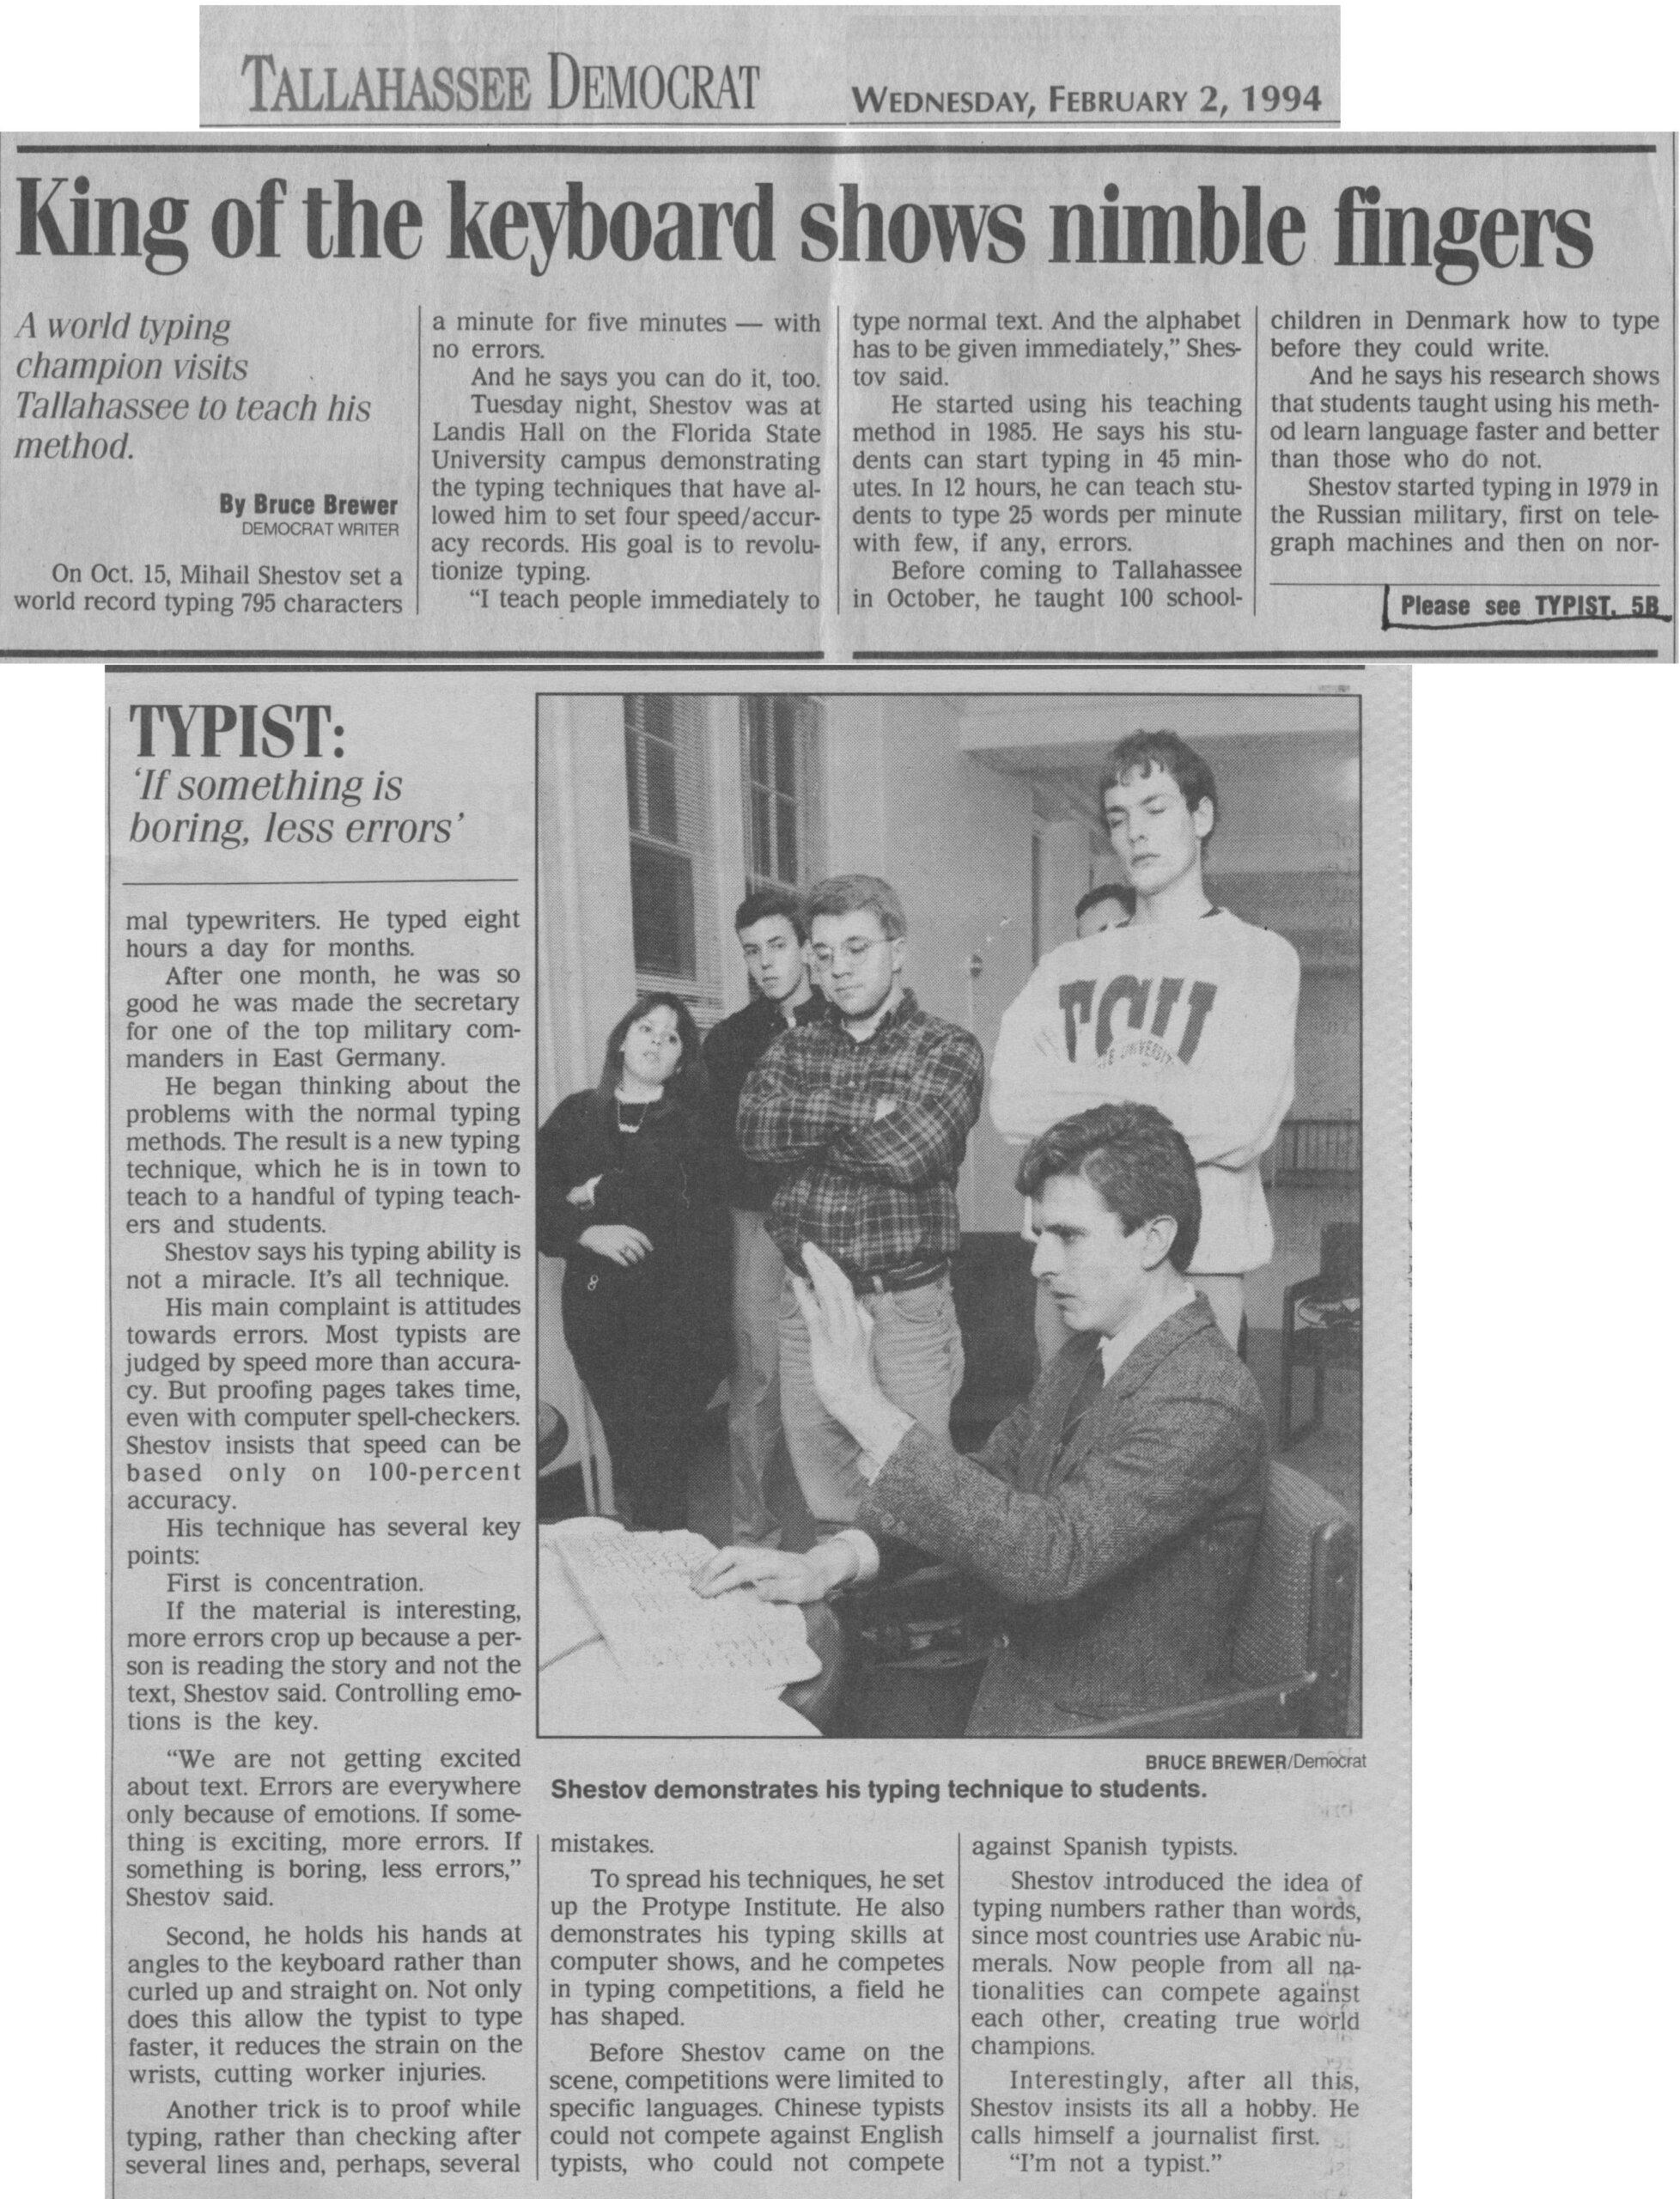 Tallahassee Democrat, 1994